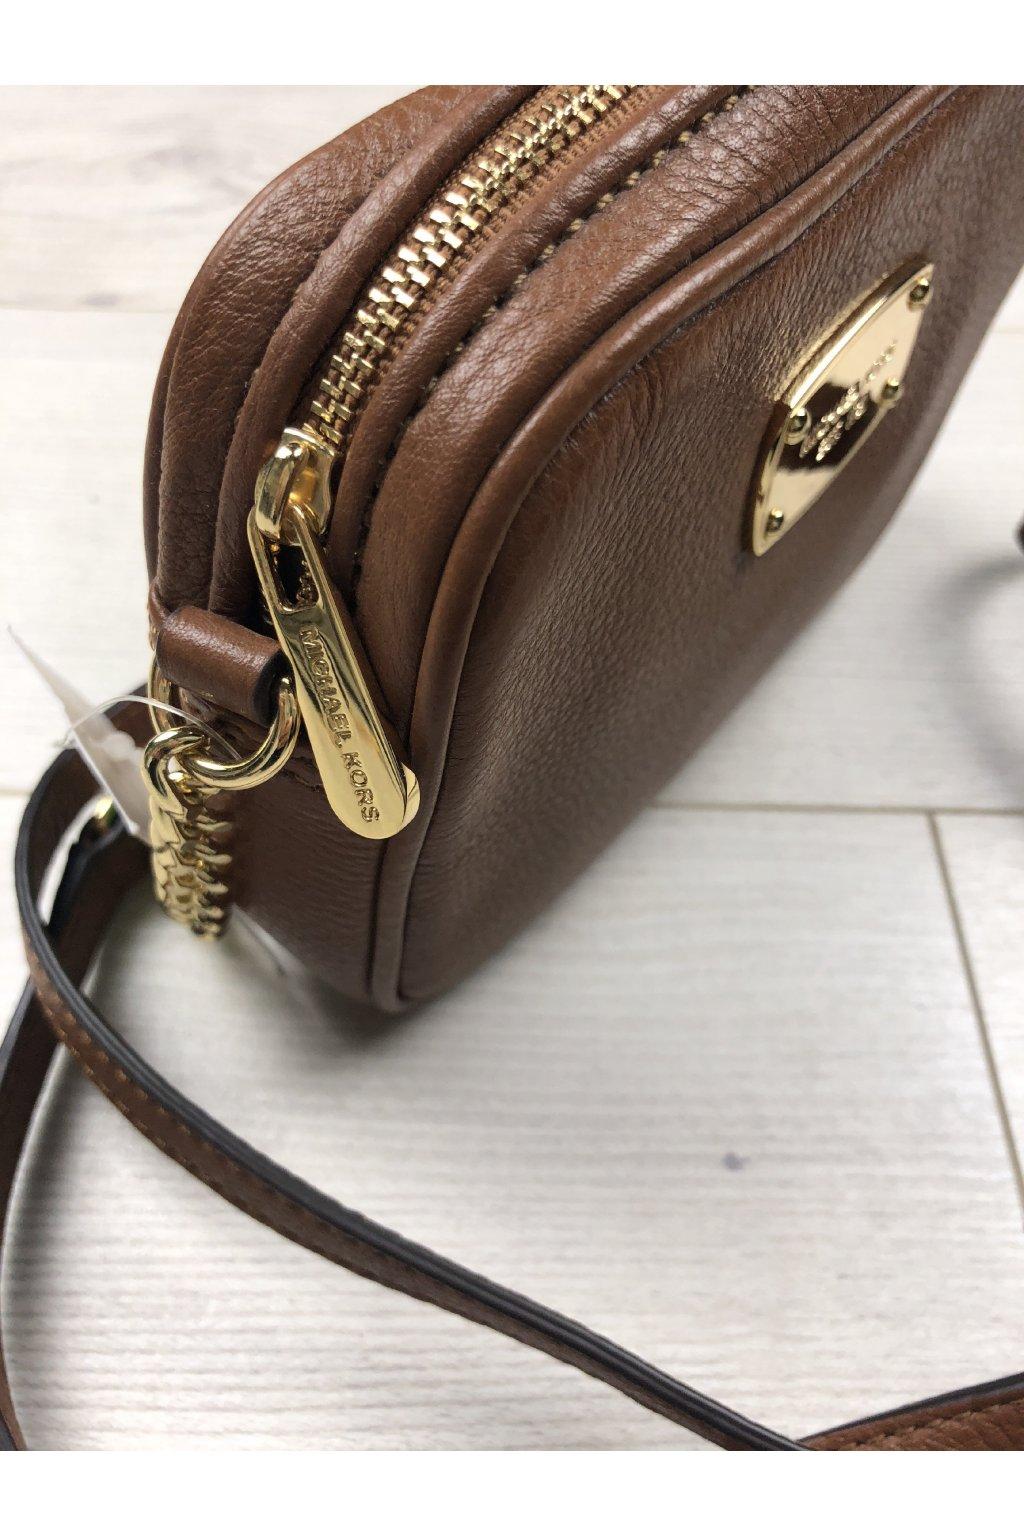 ... crossbody michael kors hamilton small luggage eshopat cz 2 ... d6c7ade37f2